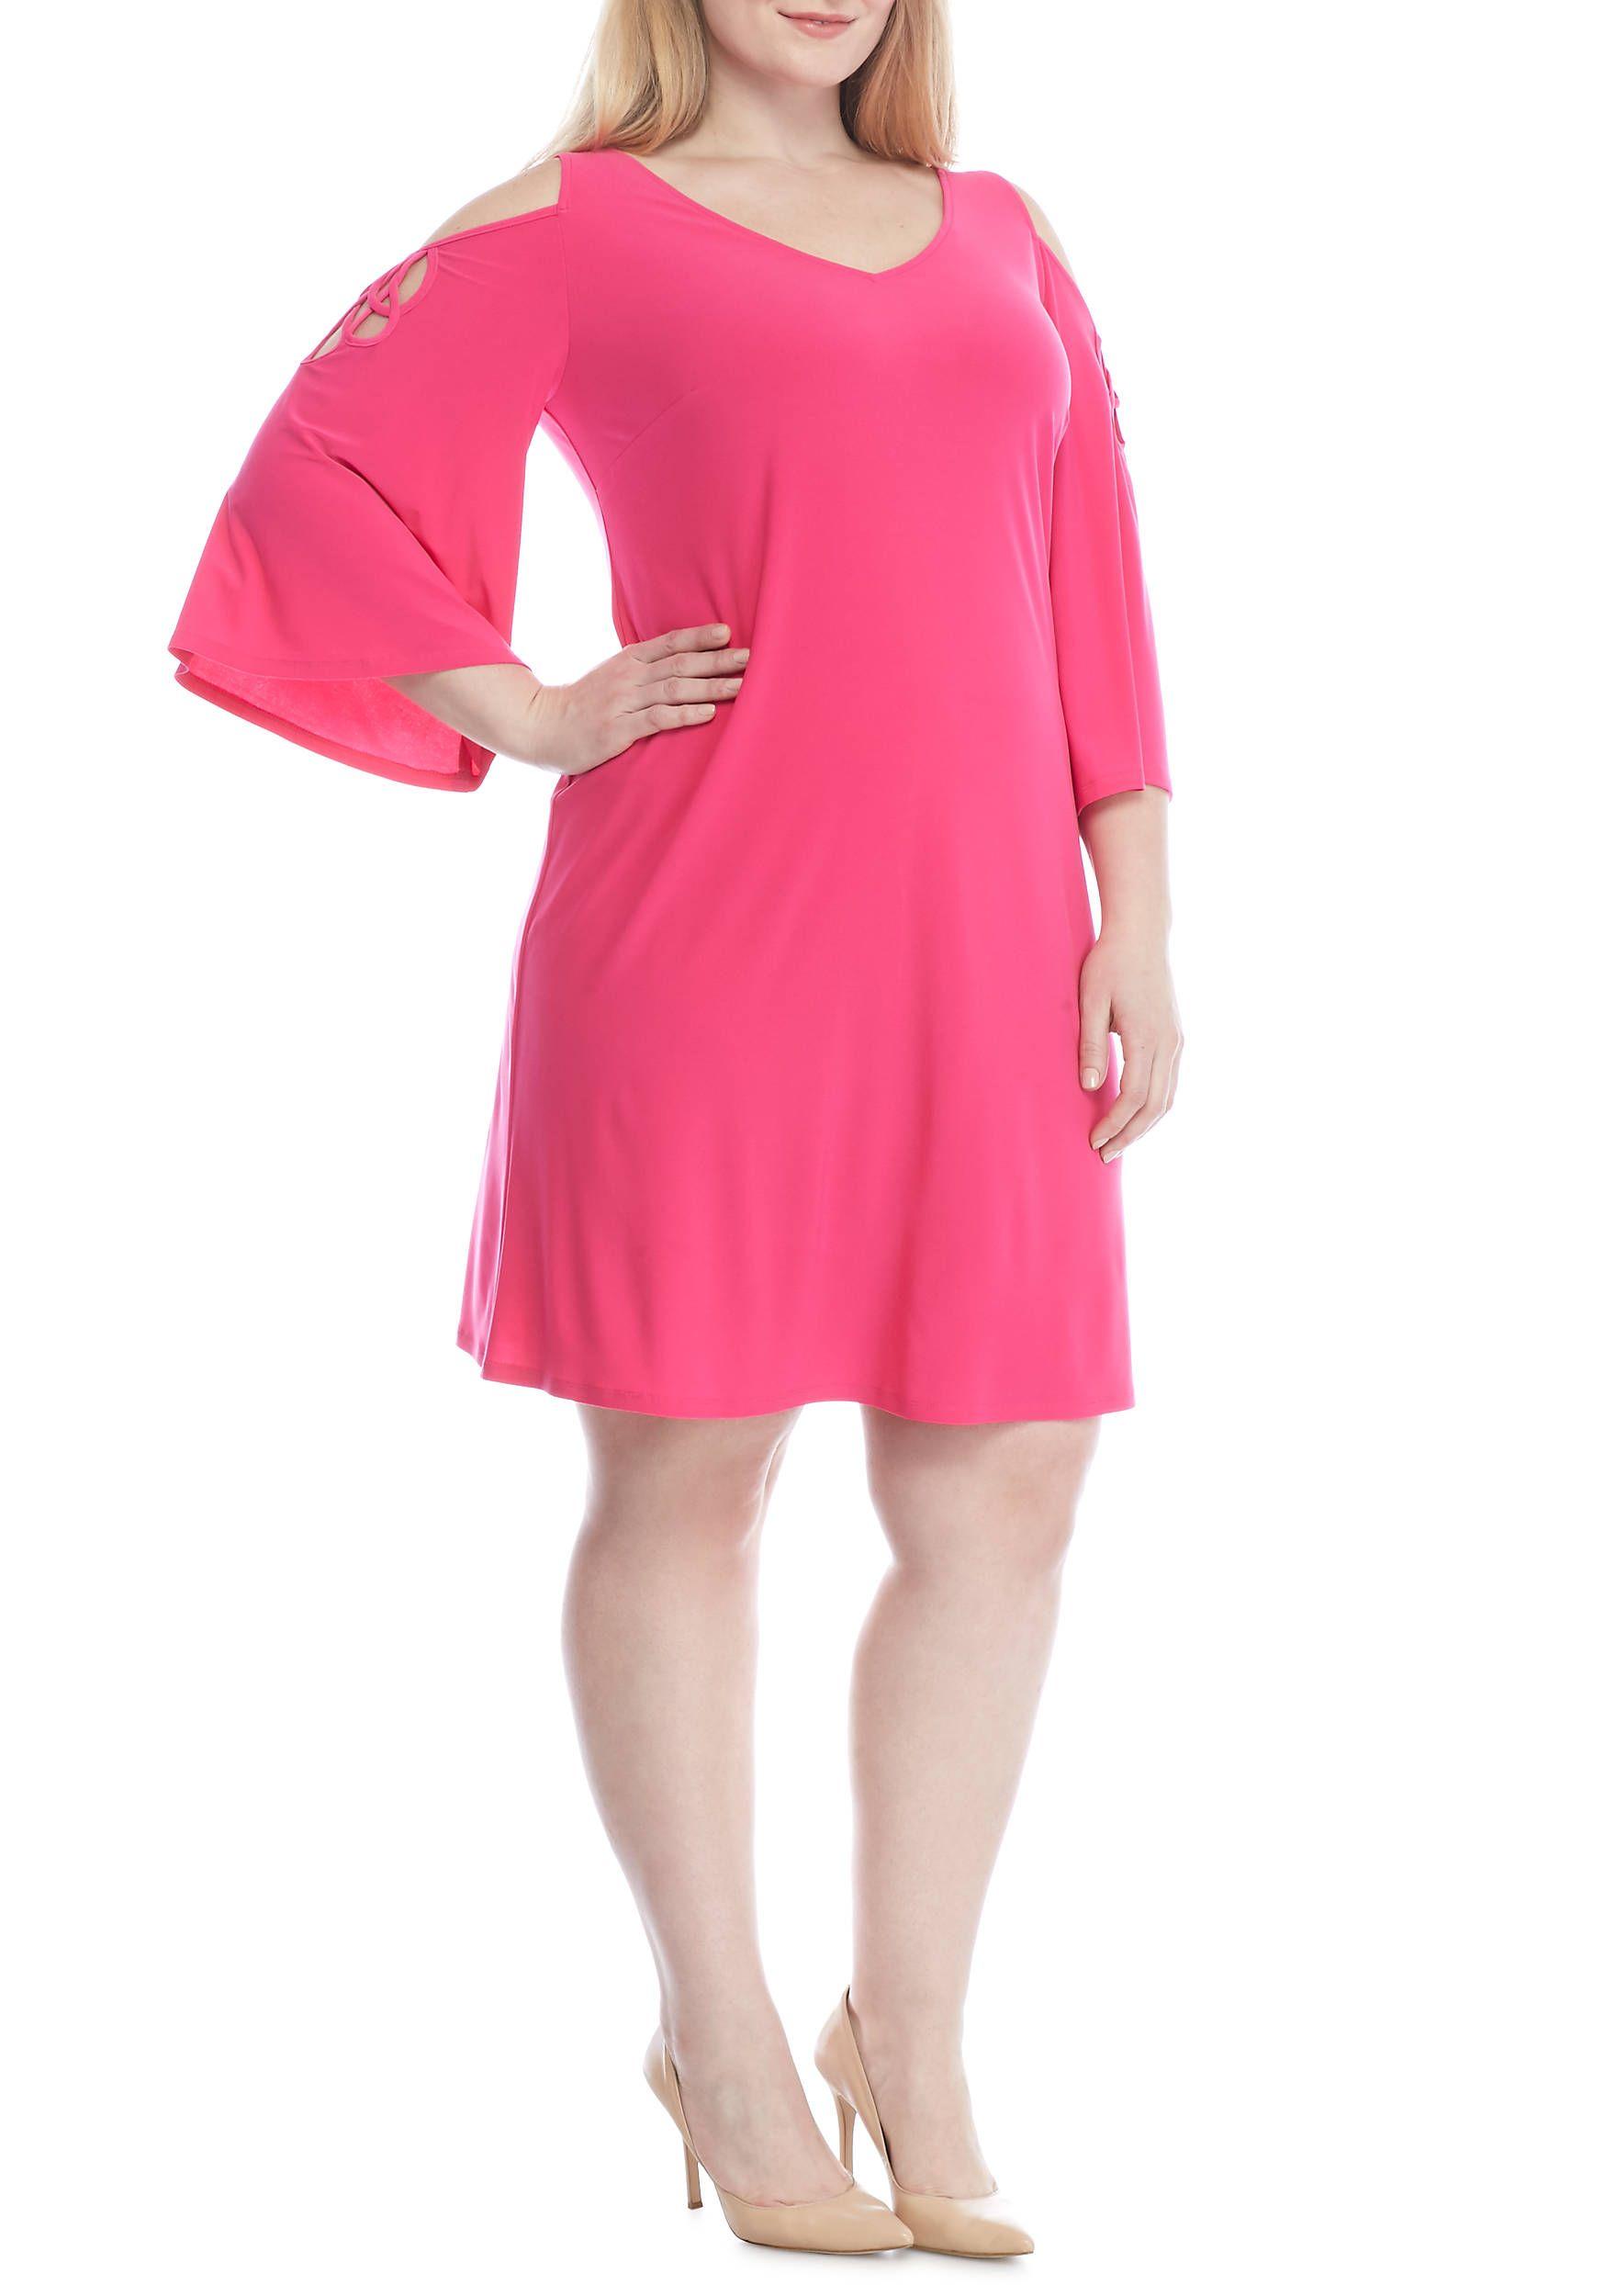 Belk Junior Plus Size Dresses - Down To Earth Bali